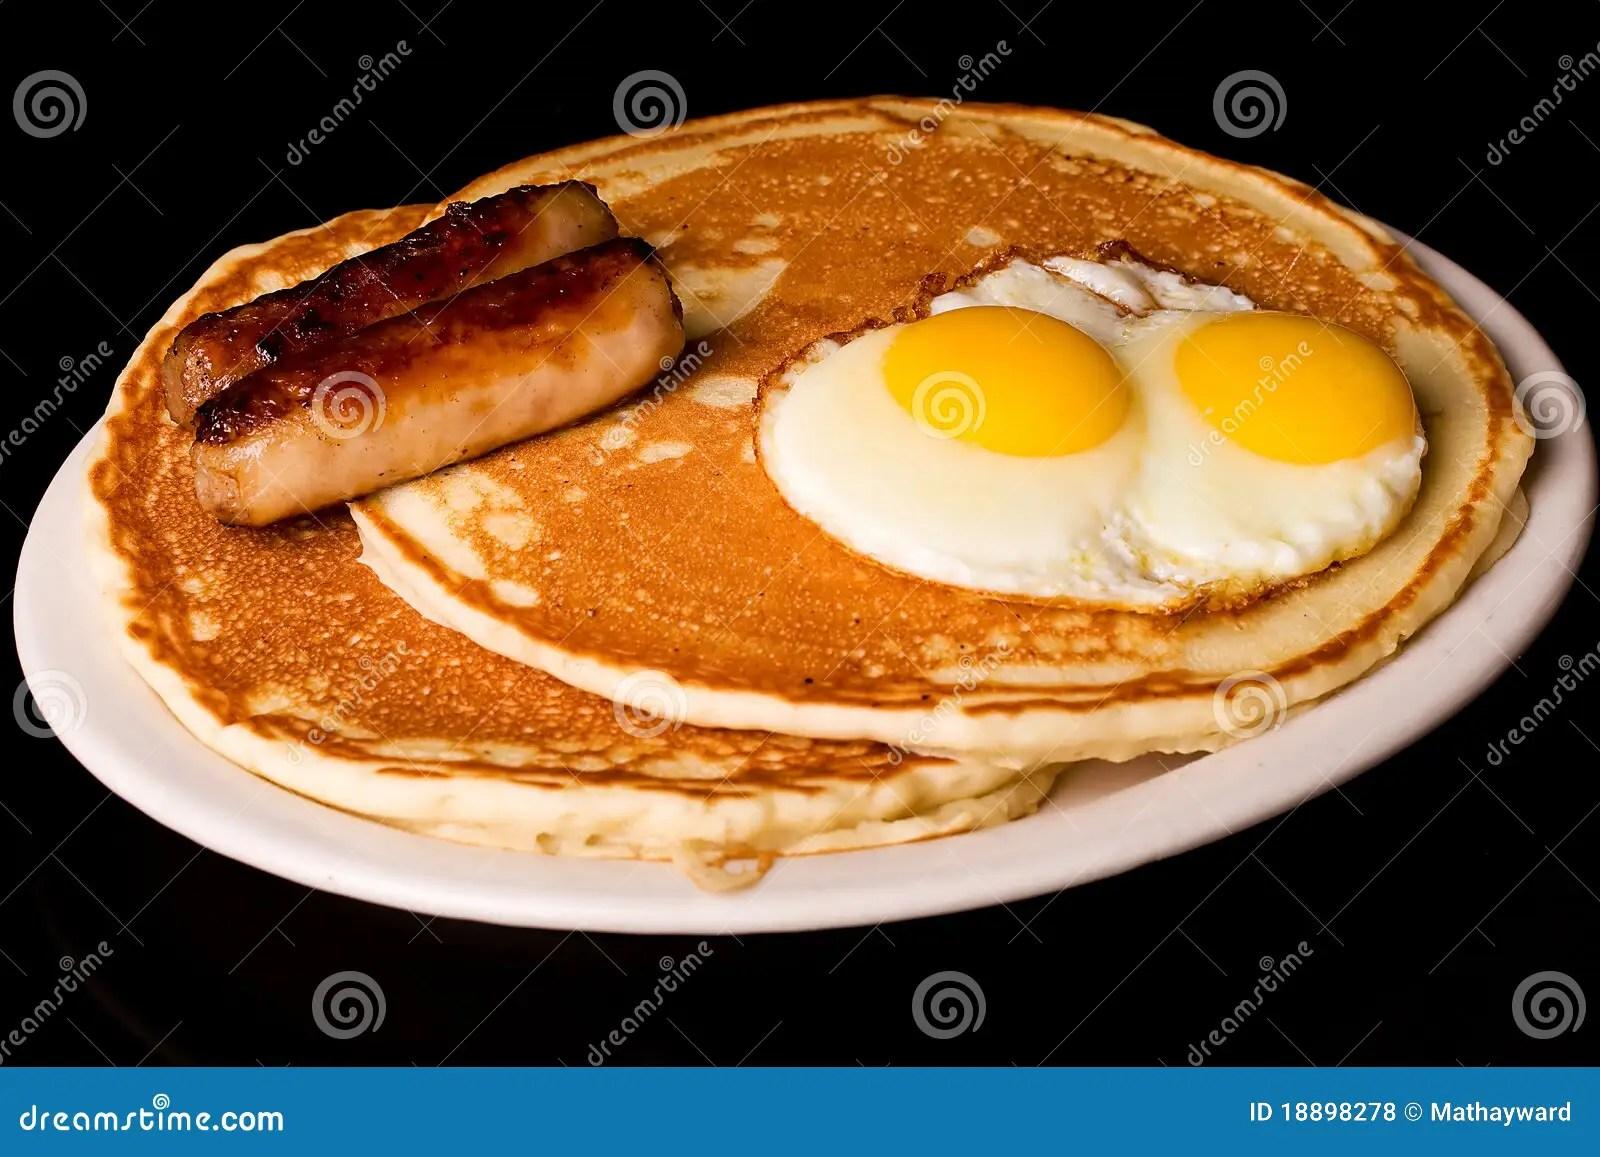 hight resolution of pancake breakfast